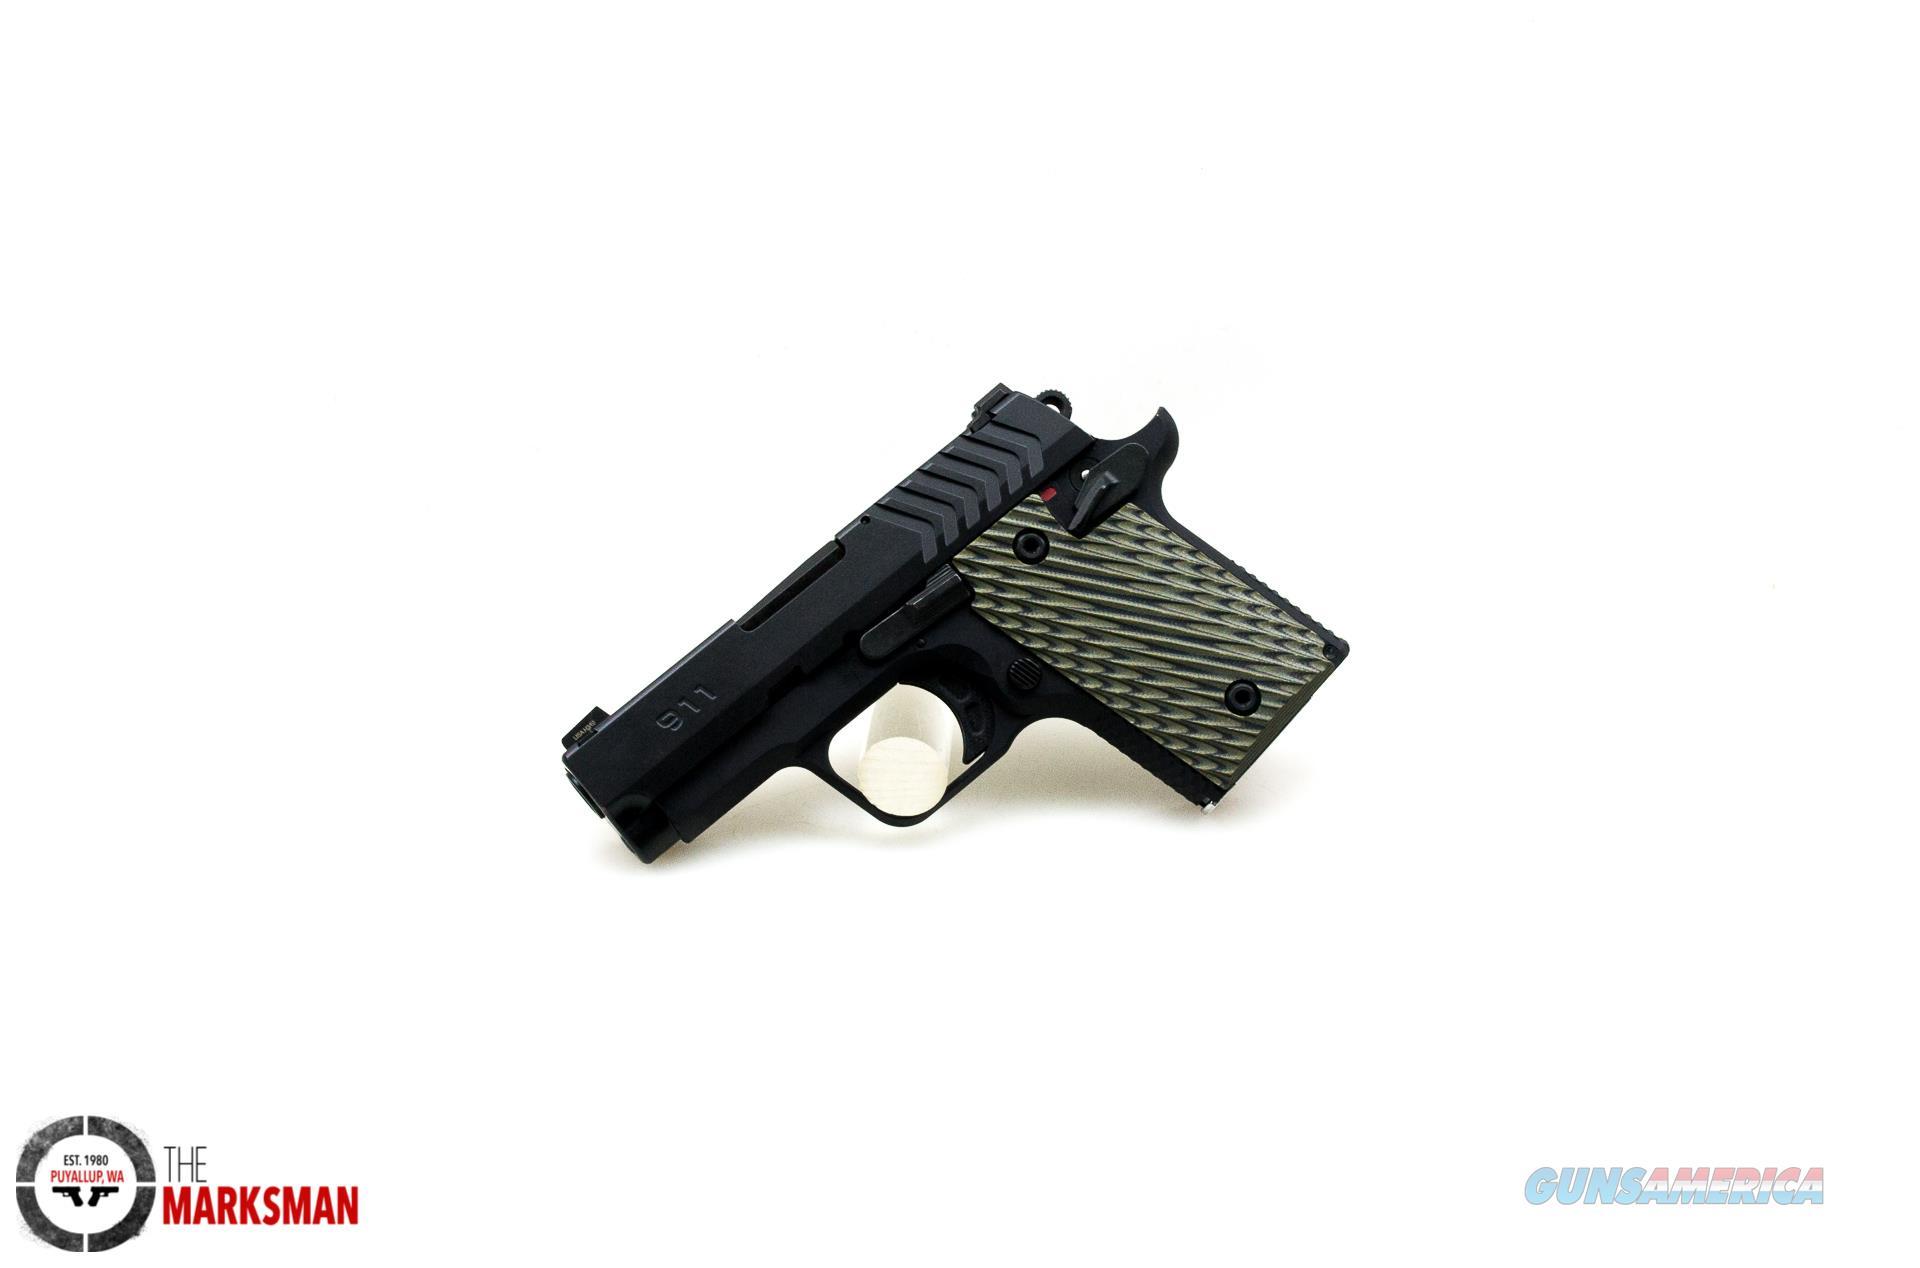 Springfield 911, 9mm NEW PG9119  Guns > Pistols > Springfield Armory Pistols > 911